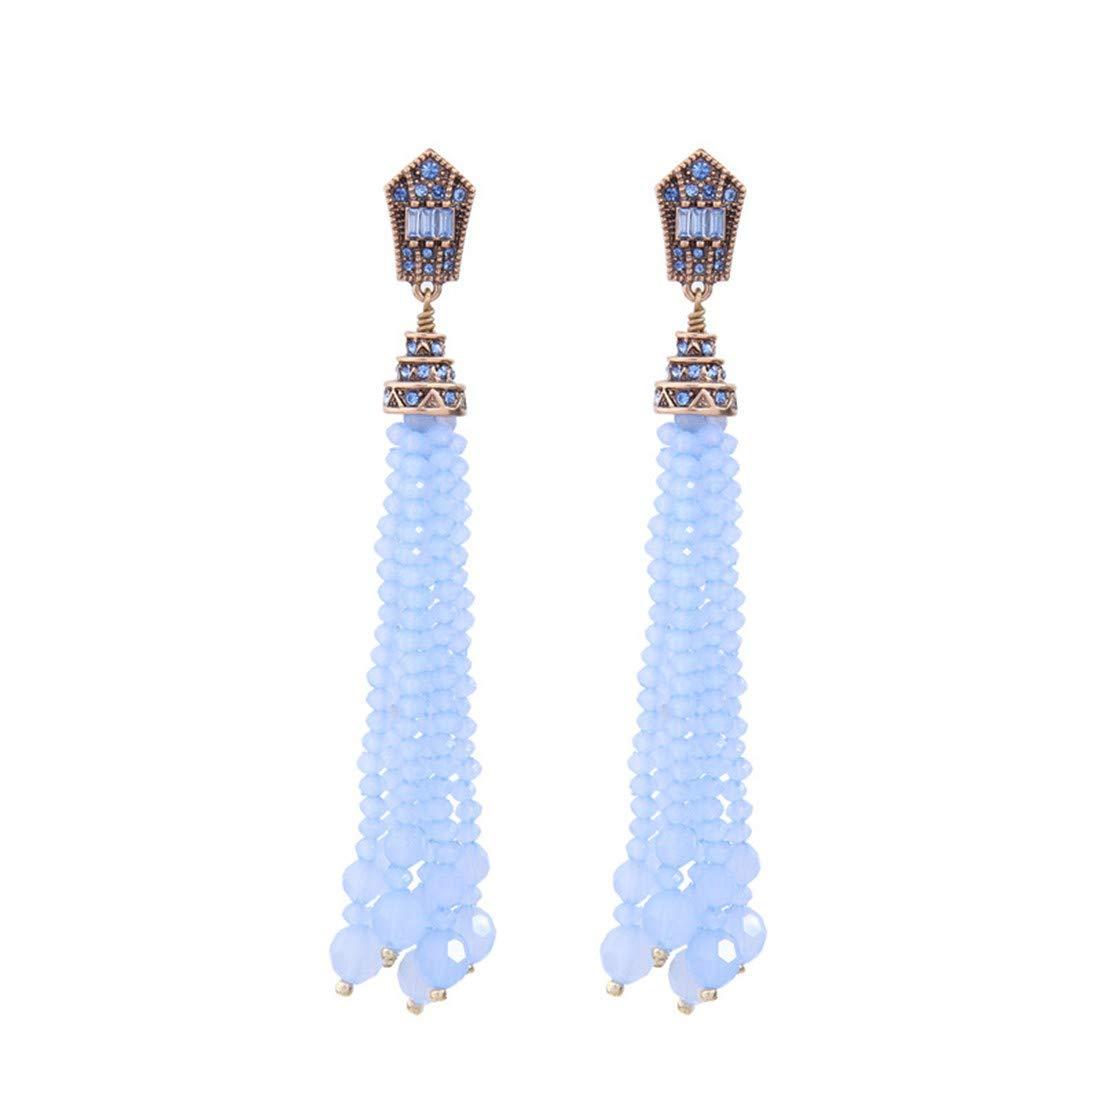 ear studs long banquet dresses. ball earrings|clip on earrings|ear cuffs|dangle earrings|earring jackets|hoop earrings|stud earrings|Tassels retro crystal beads personality earrings